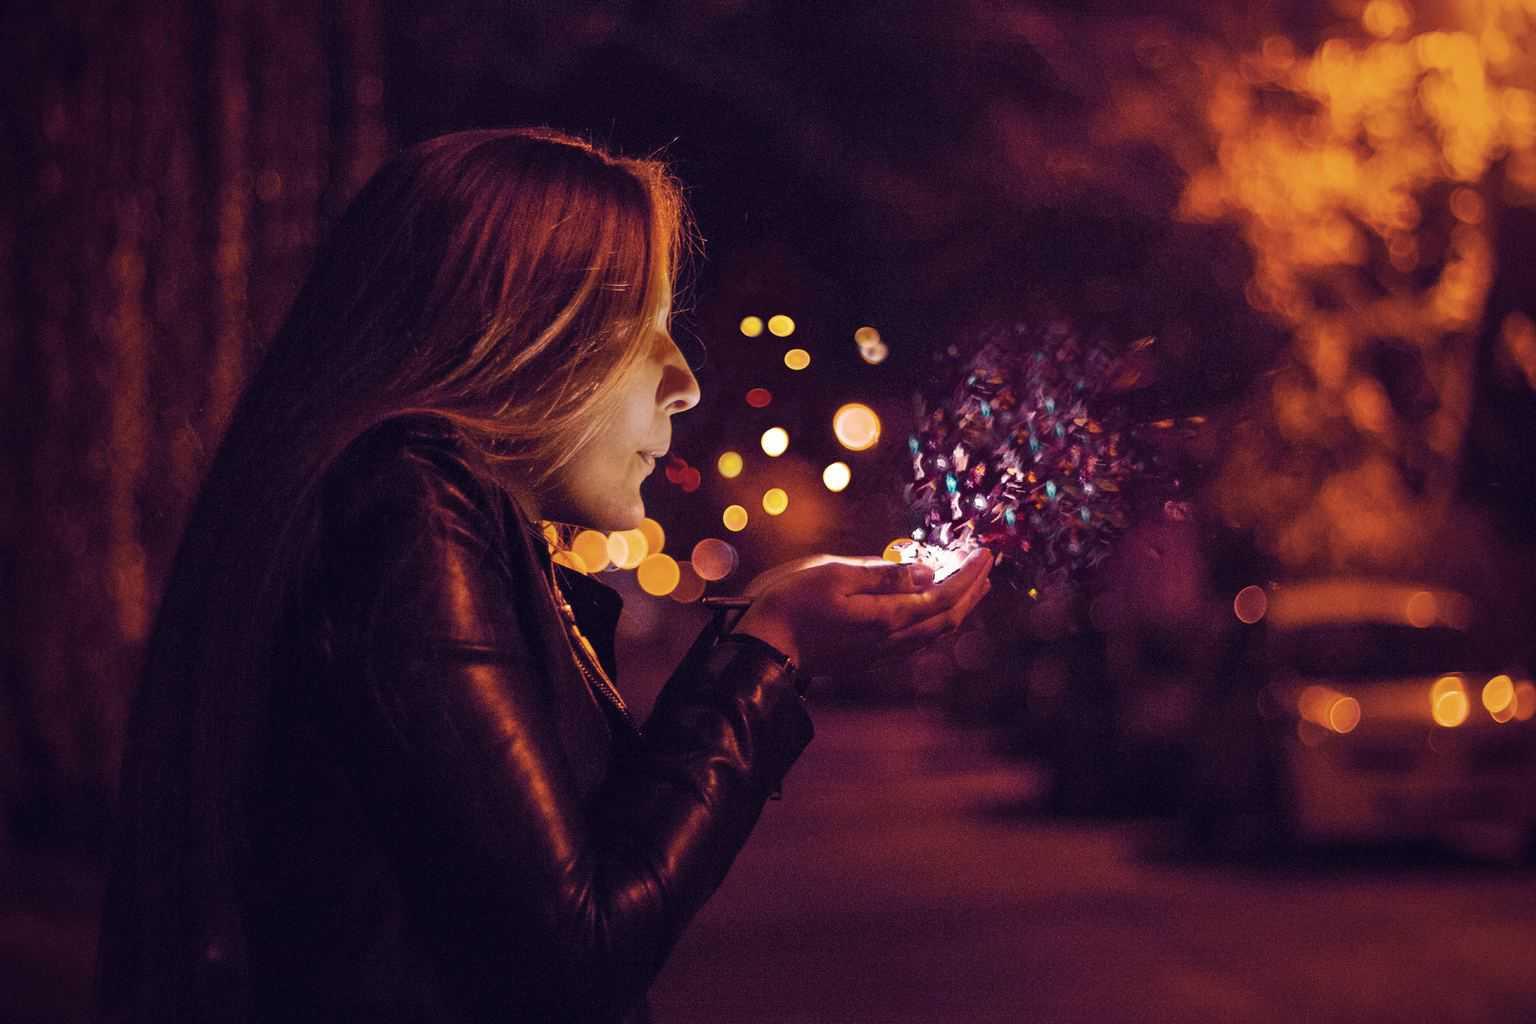 Magic in Fiction